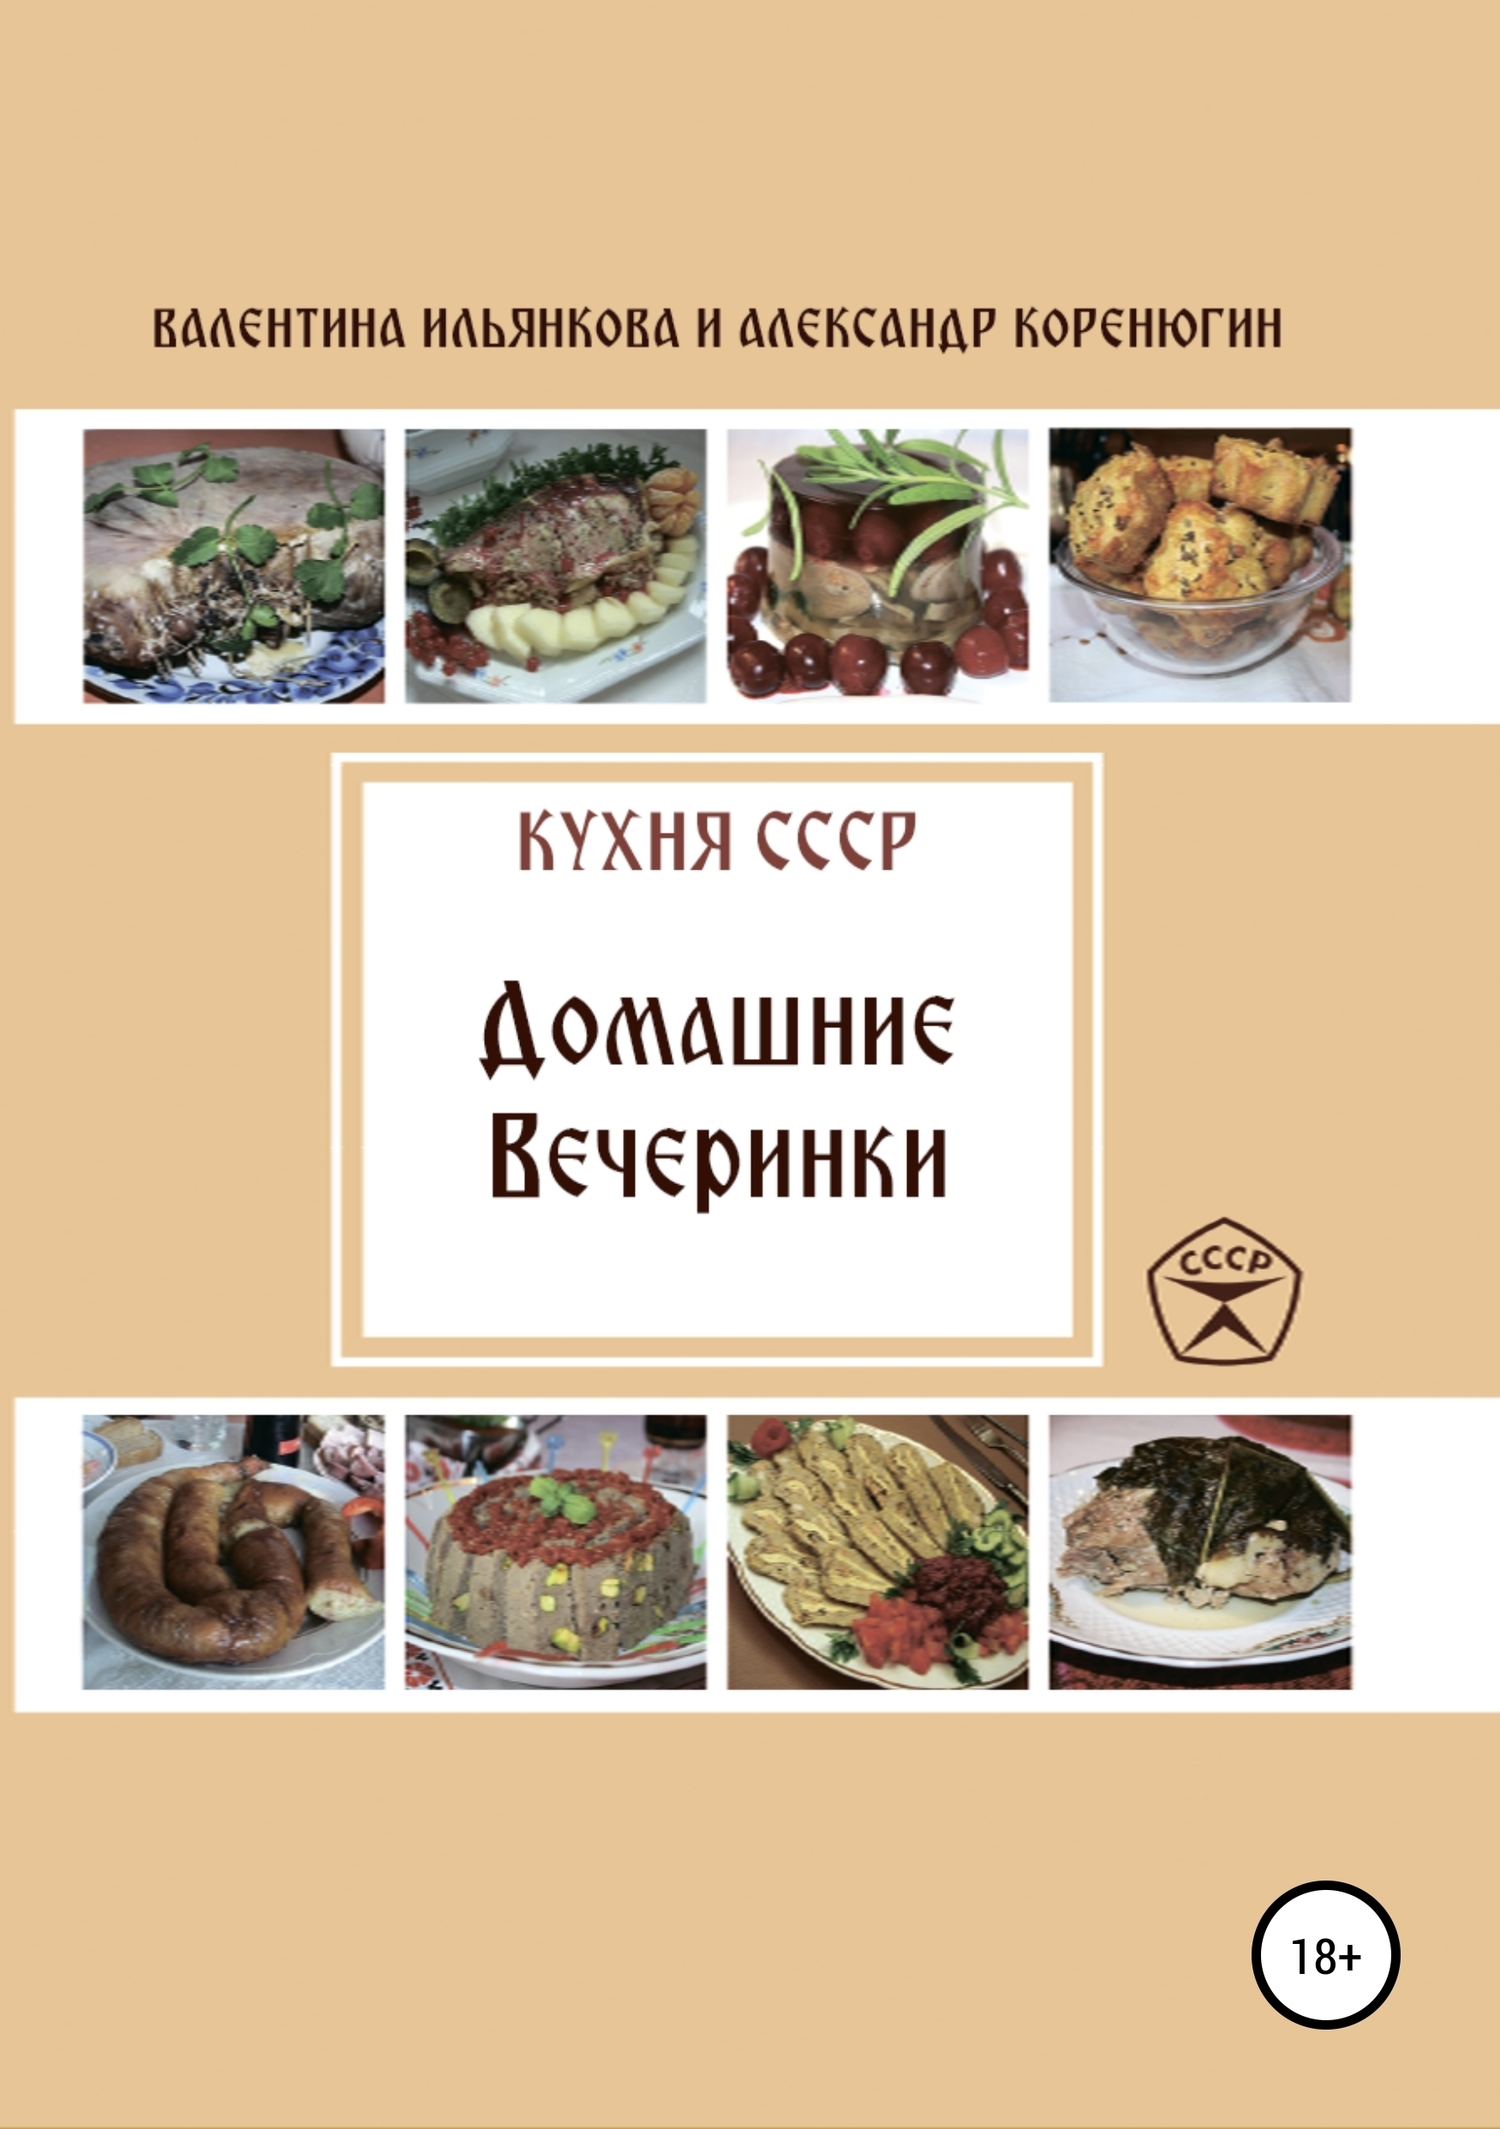 Александр Коренюгин, Валентина Ильянкова - Кухня СССР. Домашние вечеринки